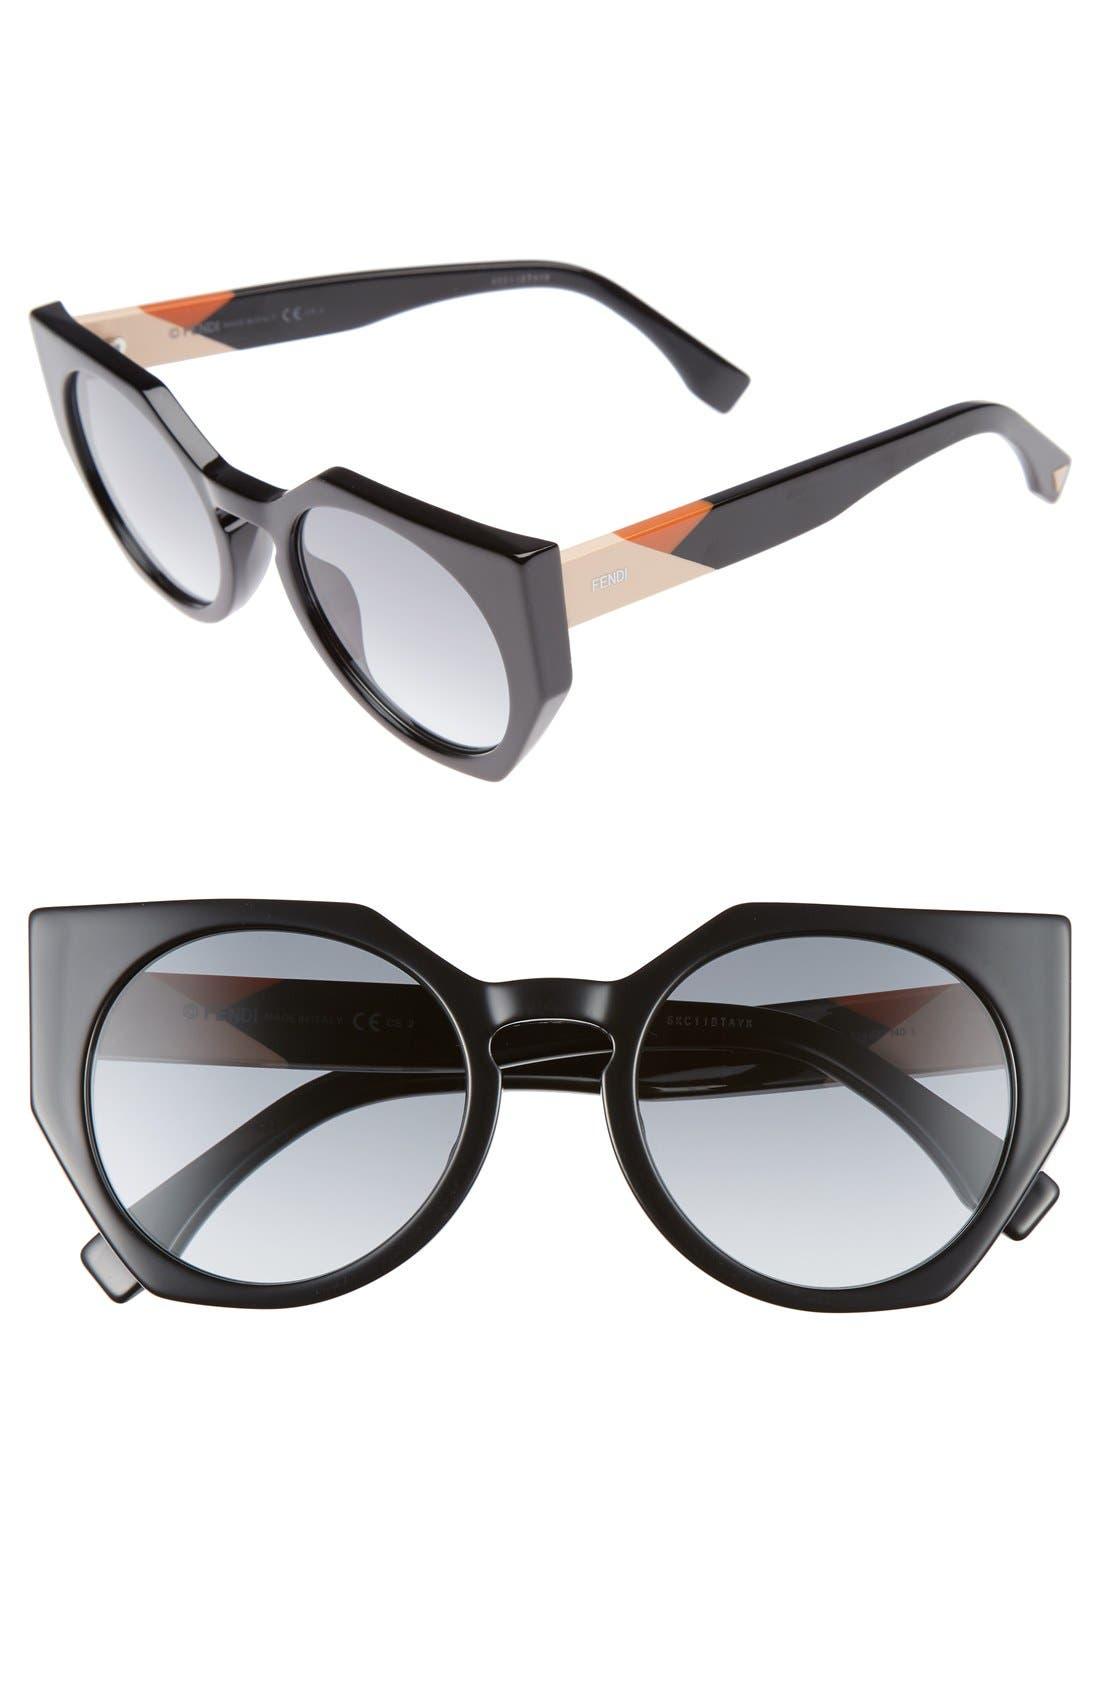 Alternate Image 1 Selected - Fendi 51mm Retro Sunglasses